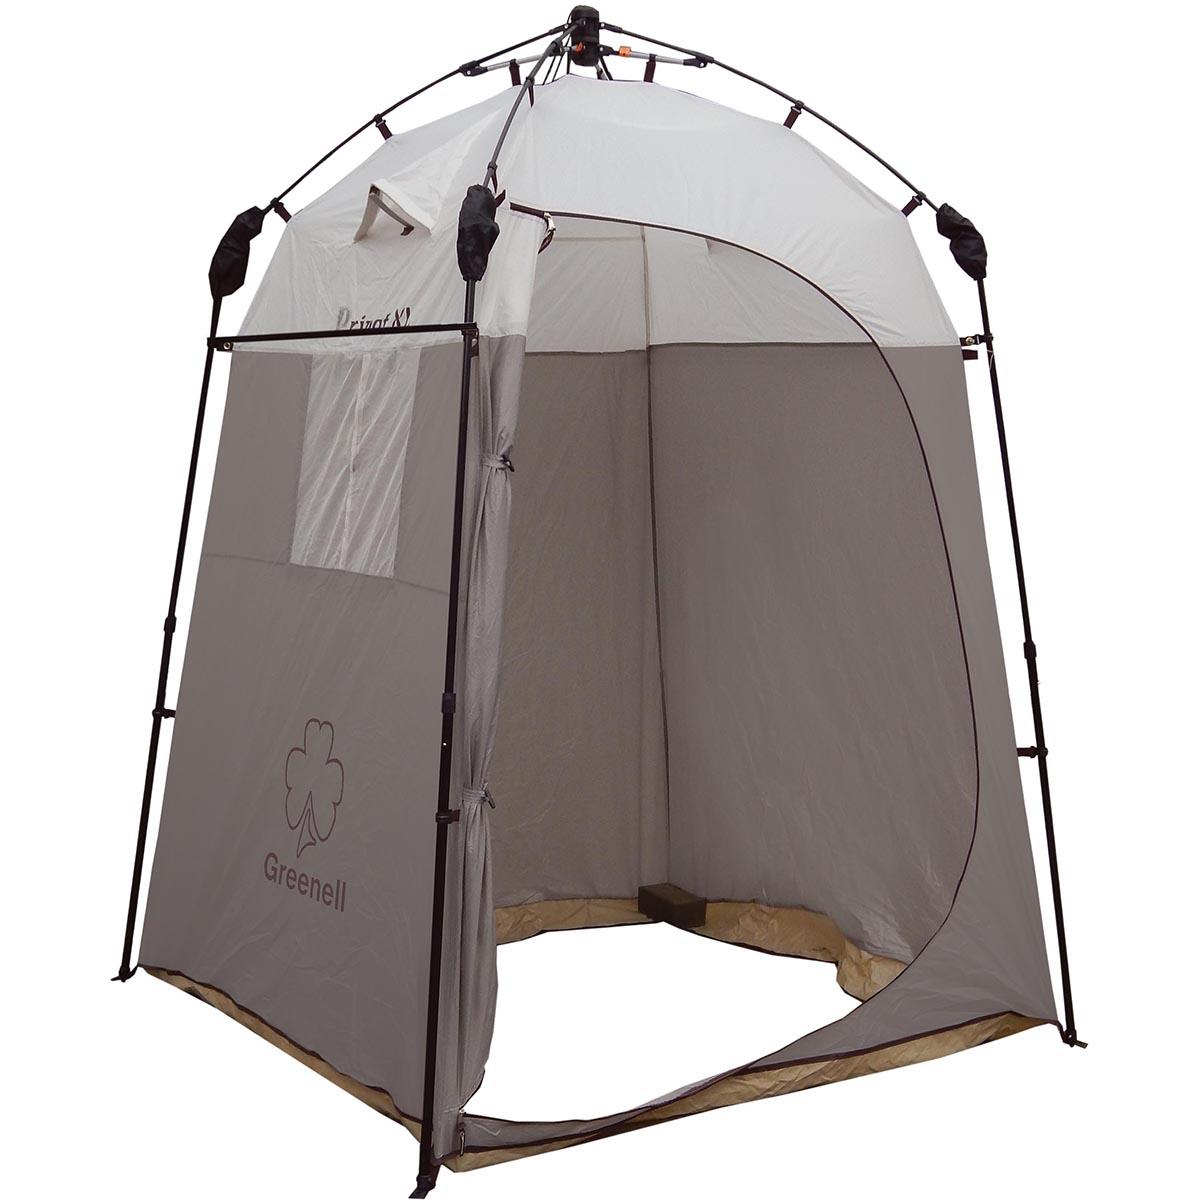 "Тент-шатер с автоматическим каркасом Greenell ""Приват XL"", цвет: коричневый"